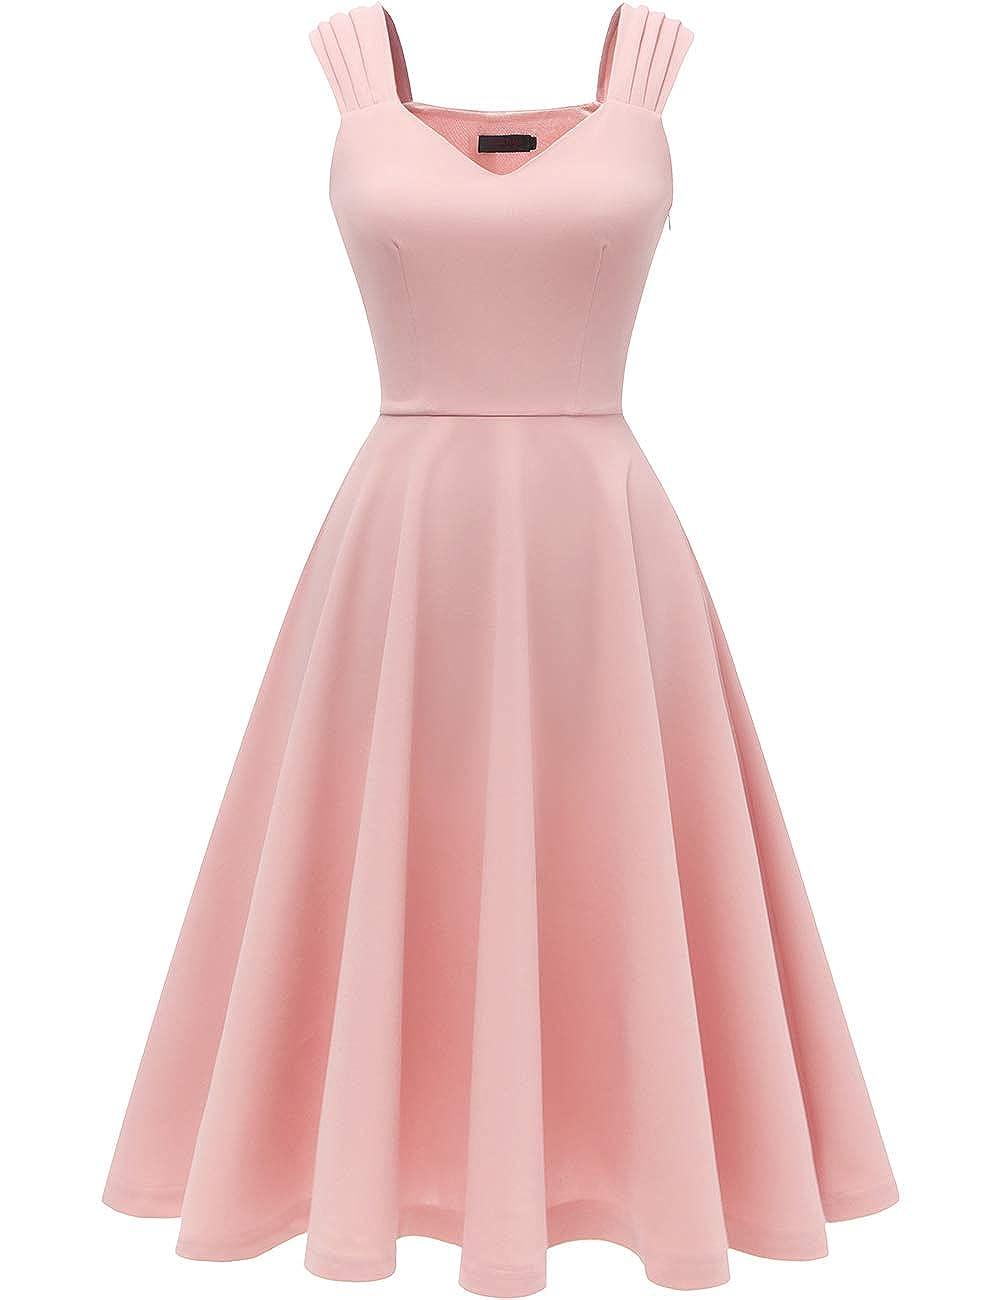 Dresstells Damen 1950er Rockabilly Kleid Vintage V-Ausschnitt Cocktailkleid Faltenrock